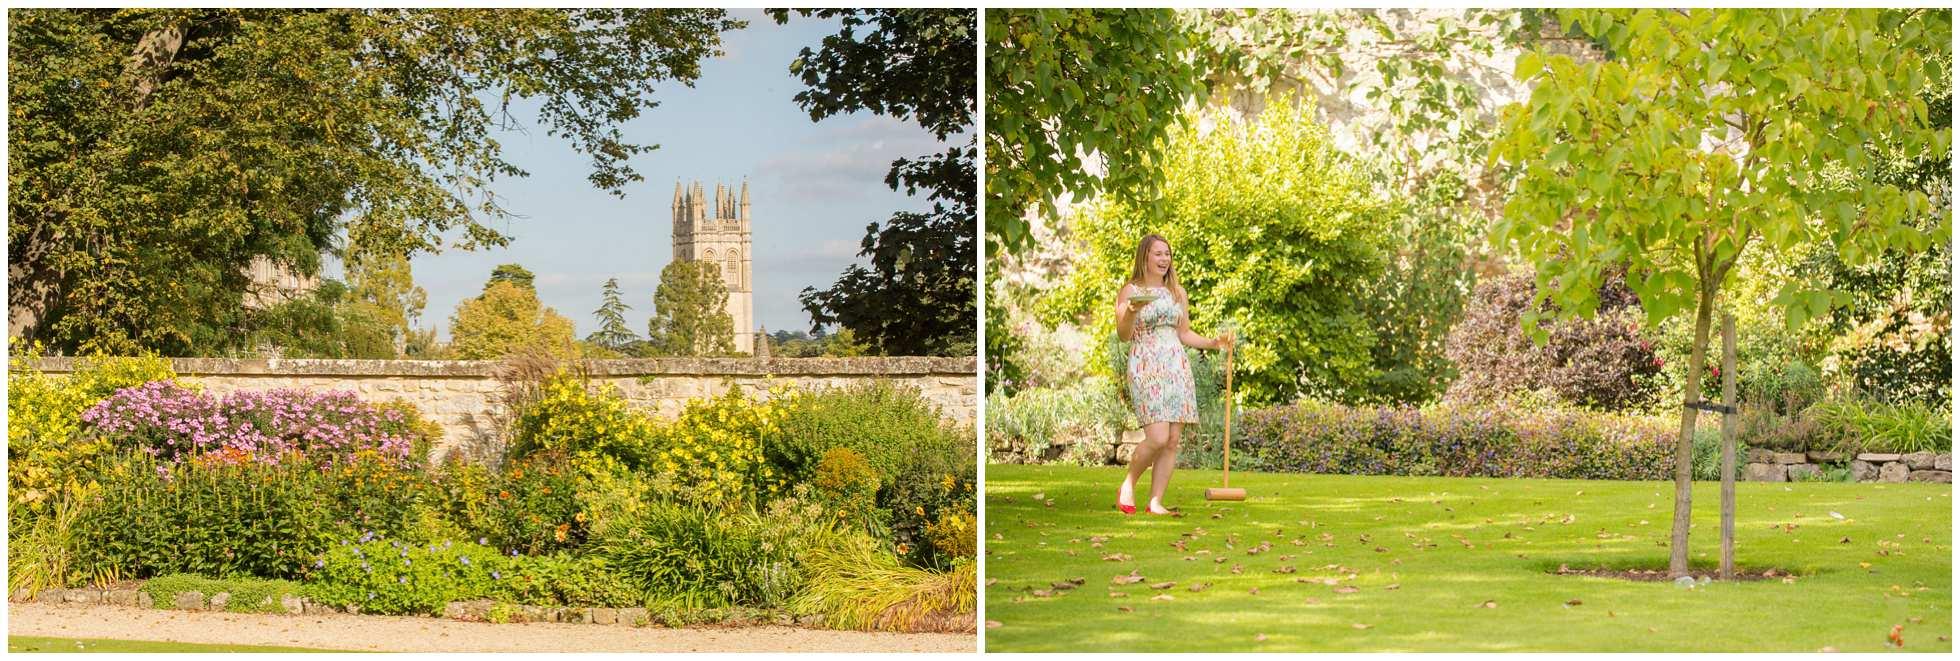 Pretty Oxford gardens